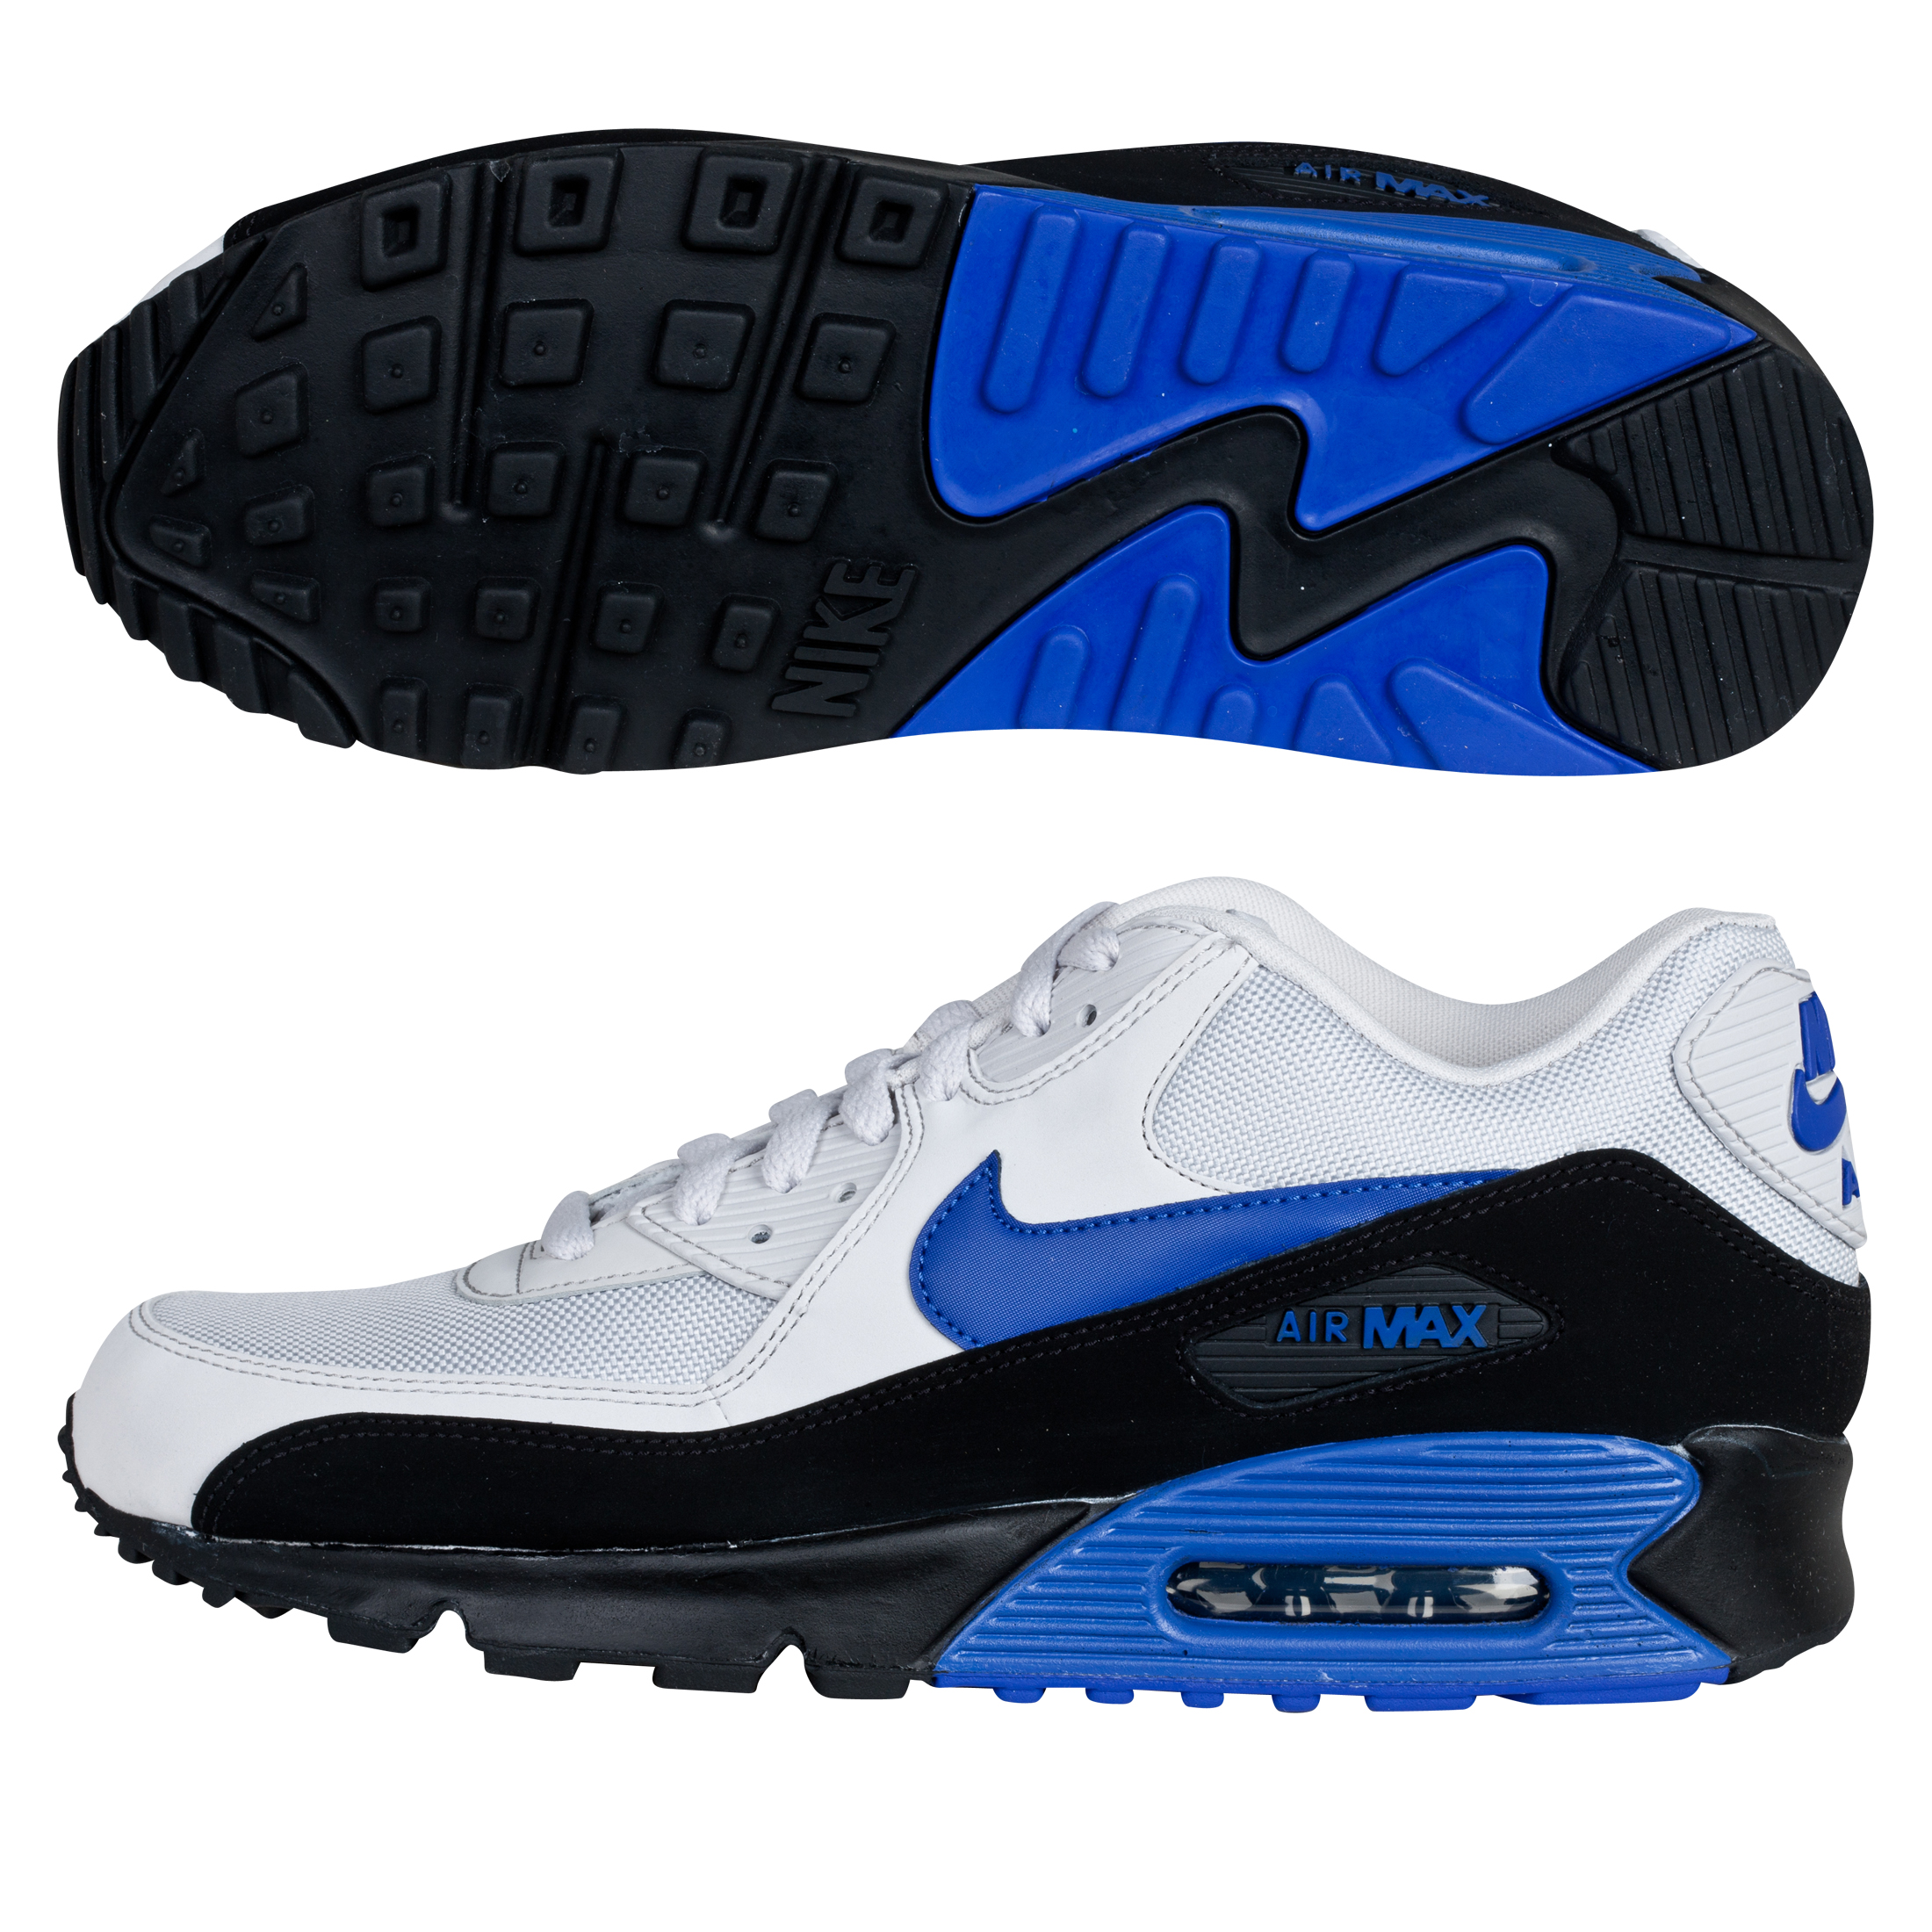 Nike Air Max 90 Essential Trainers - White/Blue